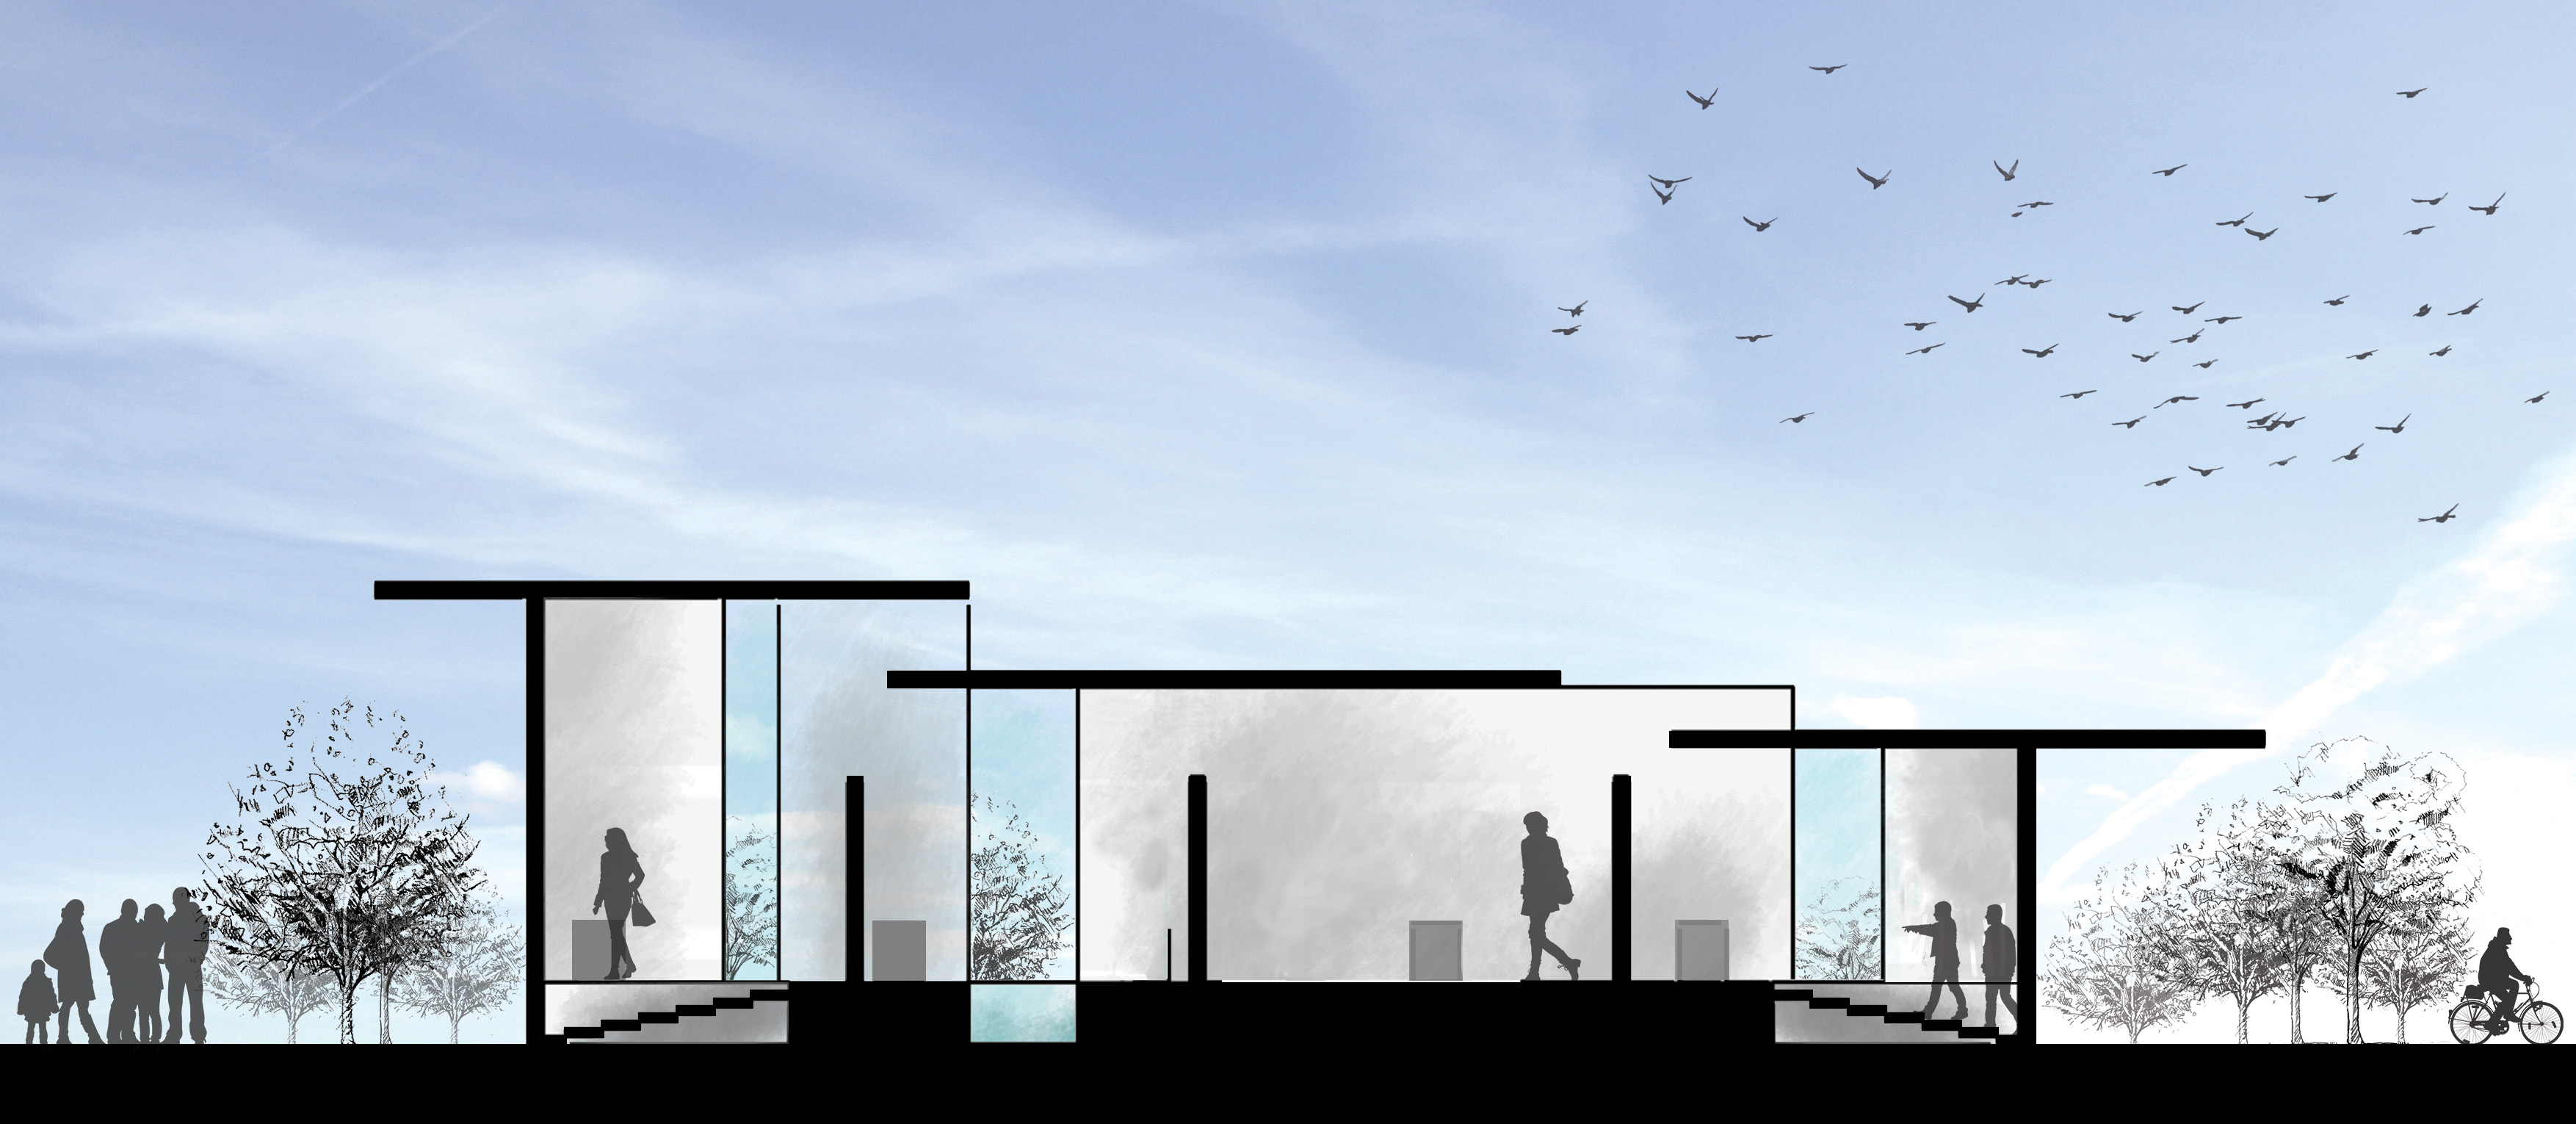 sketchup schnitt ansicht in photoshop anlegen. Black Bedroom Furniture Sets. Home Design Ideas